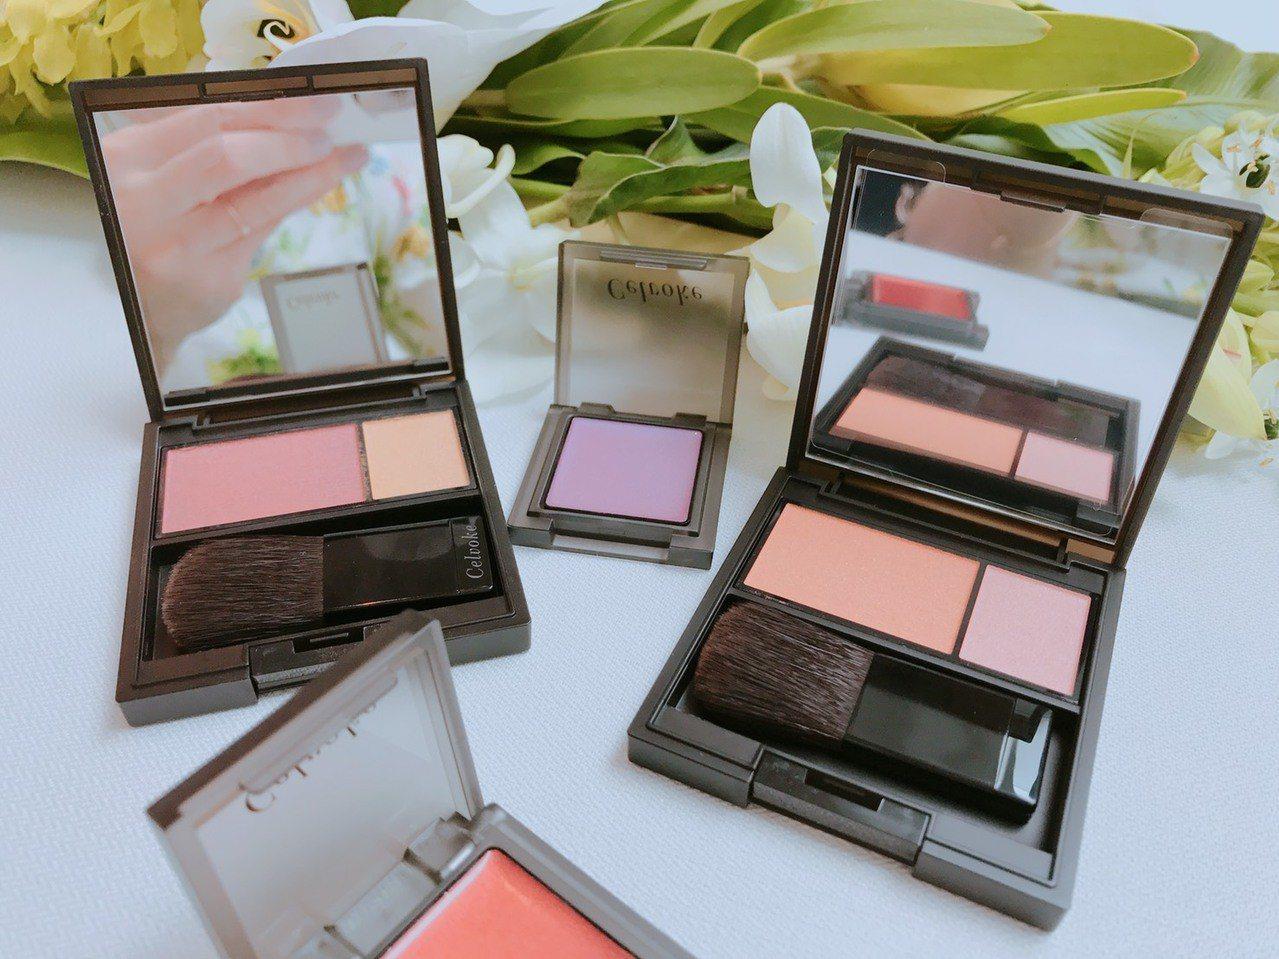 Celvoke思歐珂全系列彩妝皆訴求不含矽靈、合成香料、動物成分、紫外線吸收劑、...